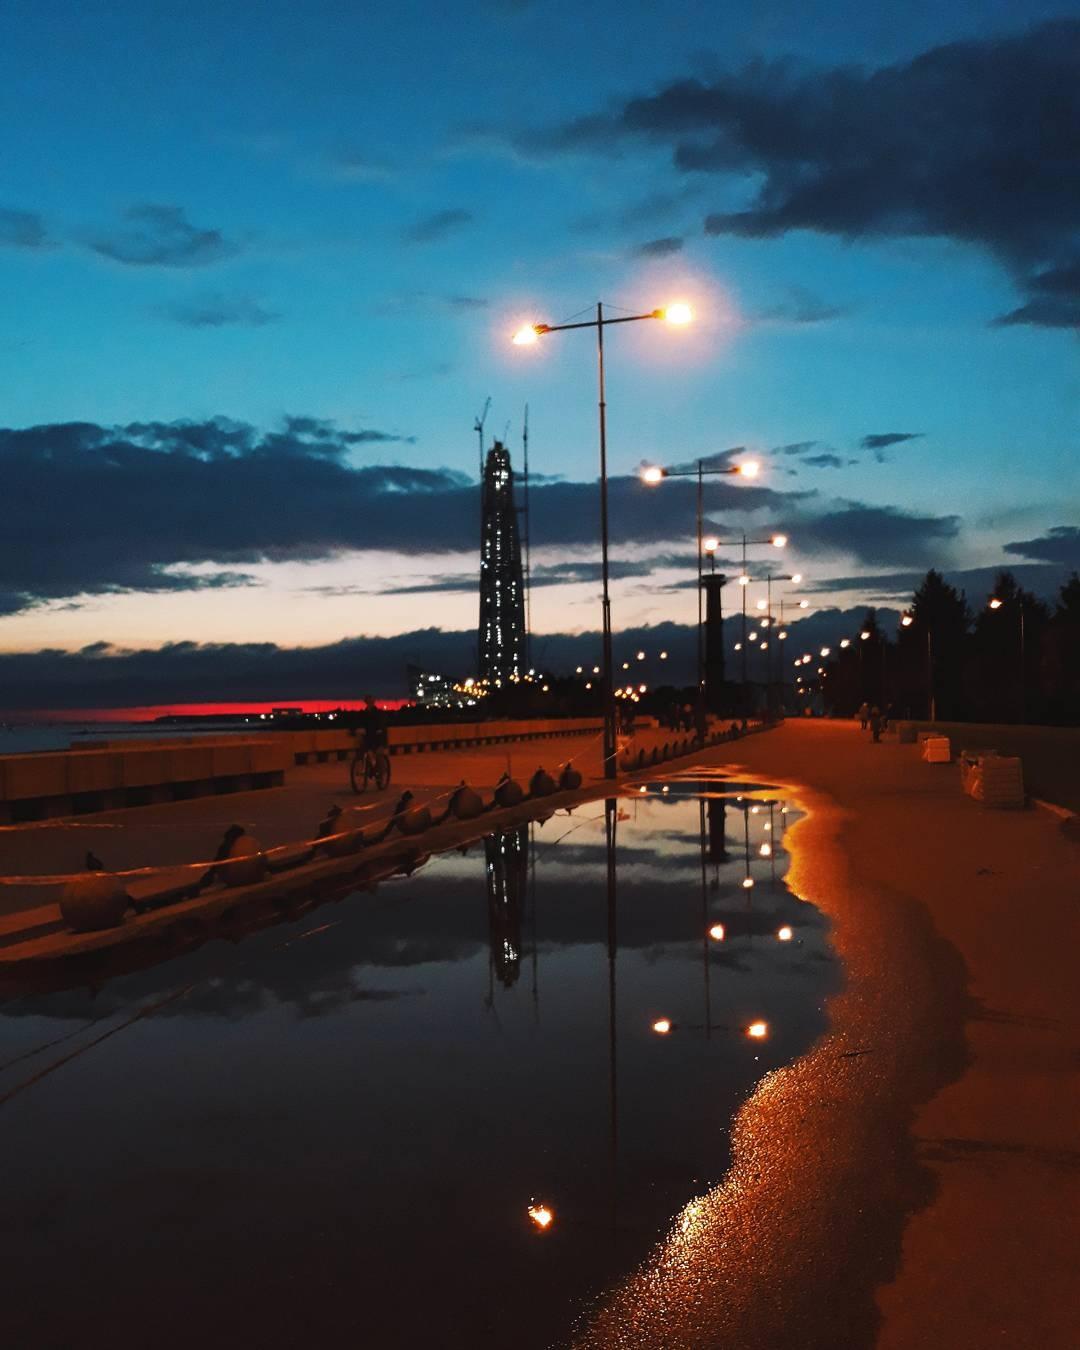 The Night is Tender by Arina Tatarskaya